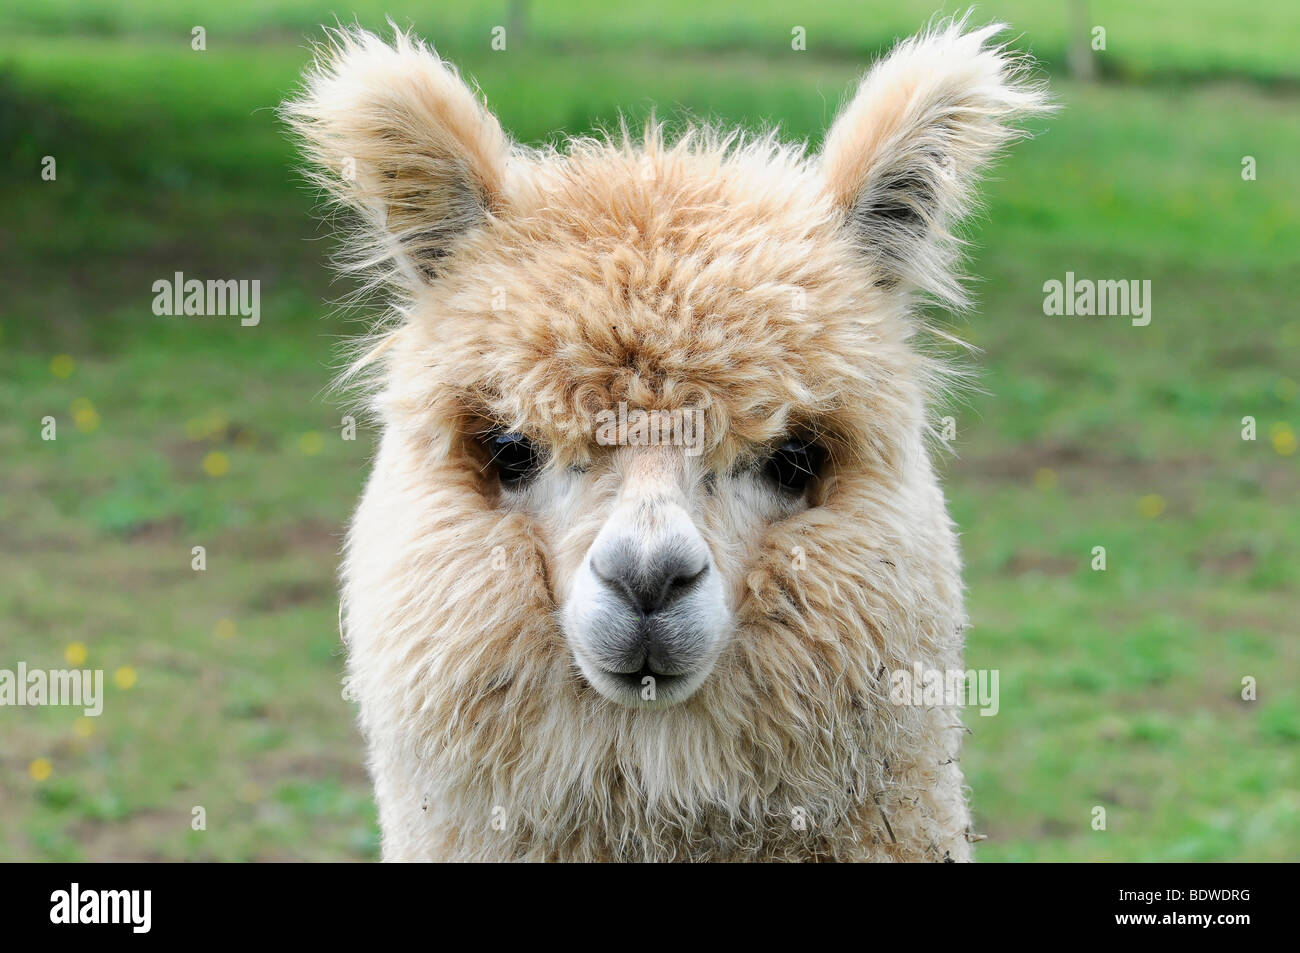 Alpaca (Lama pacos), Waldstetten, Baden-Wuerttemberg, Germany, Europe - Stock Image